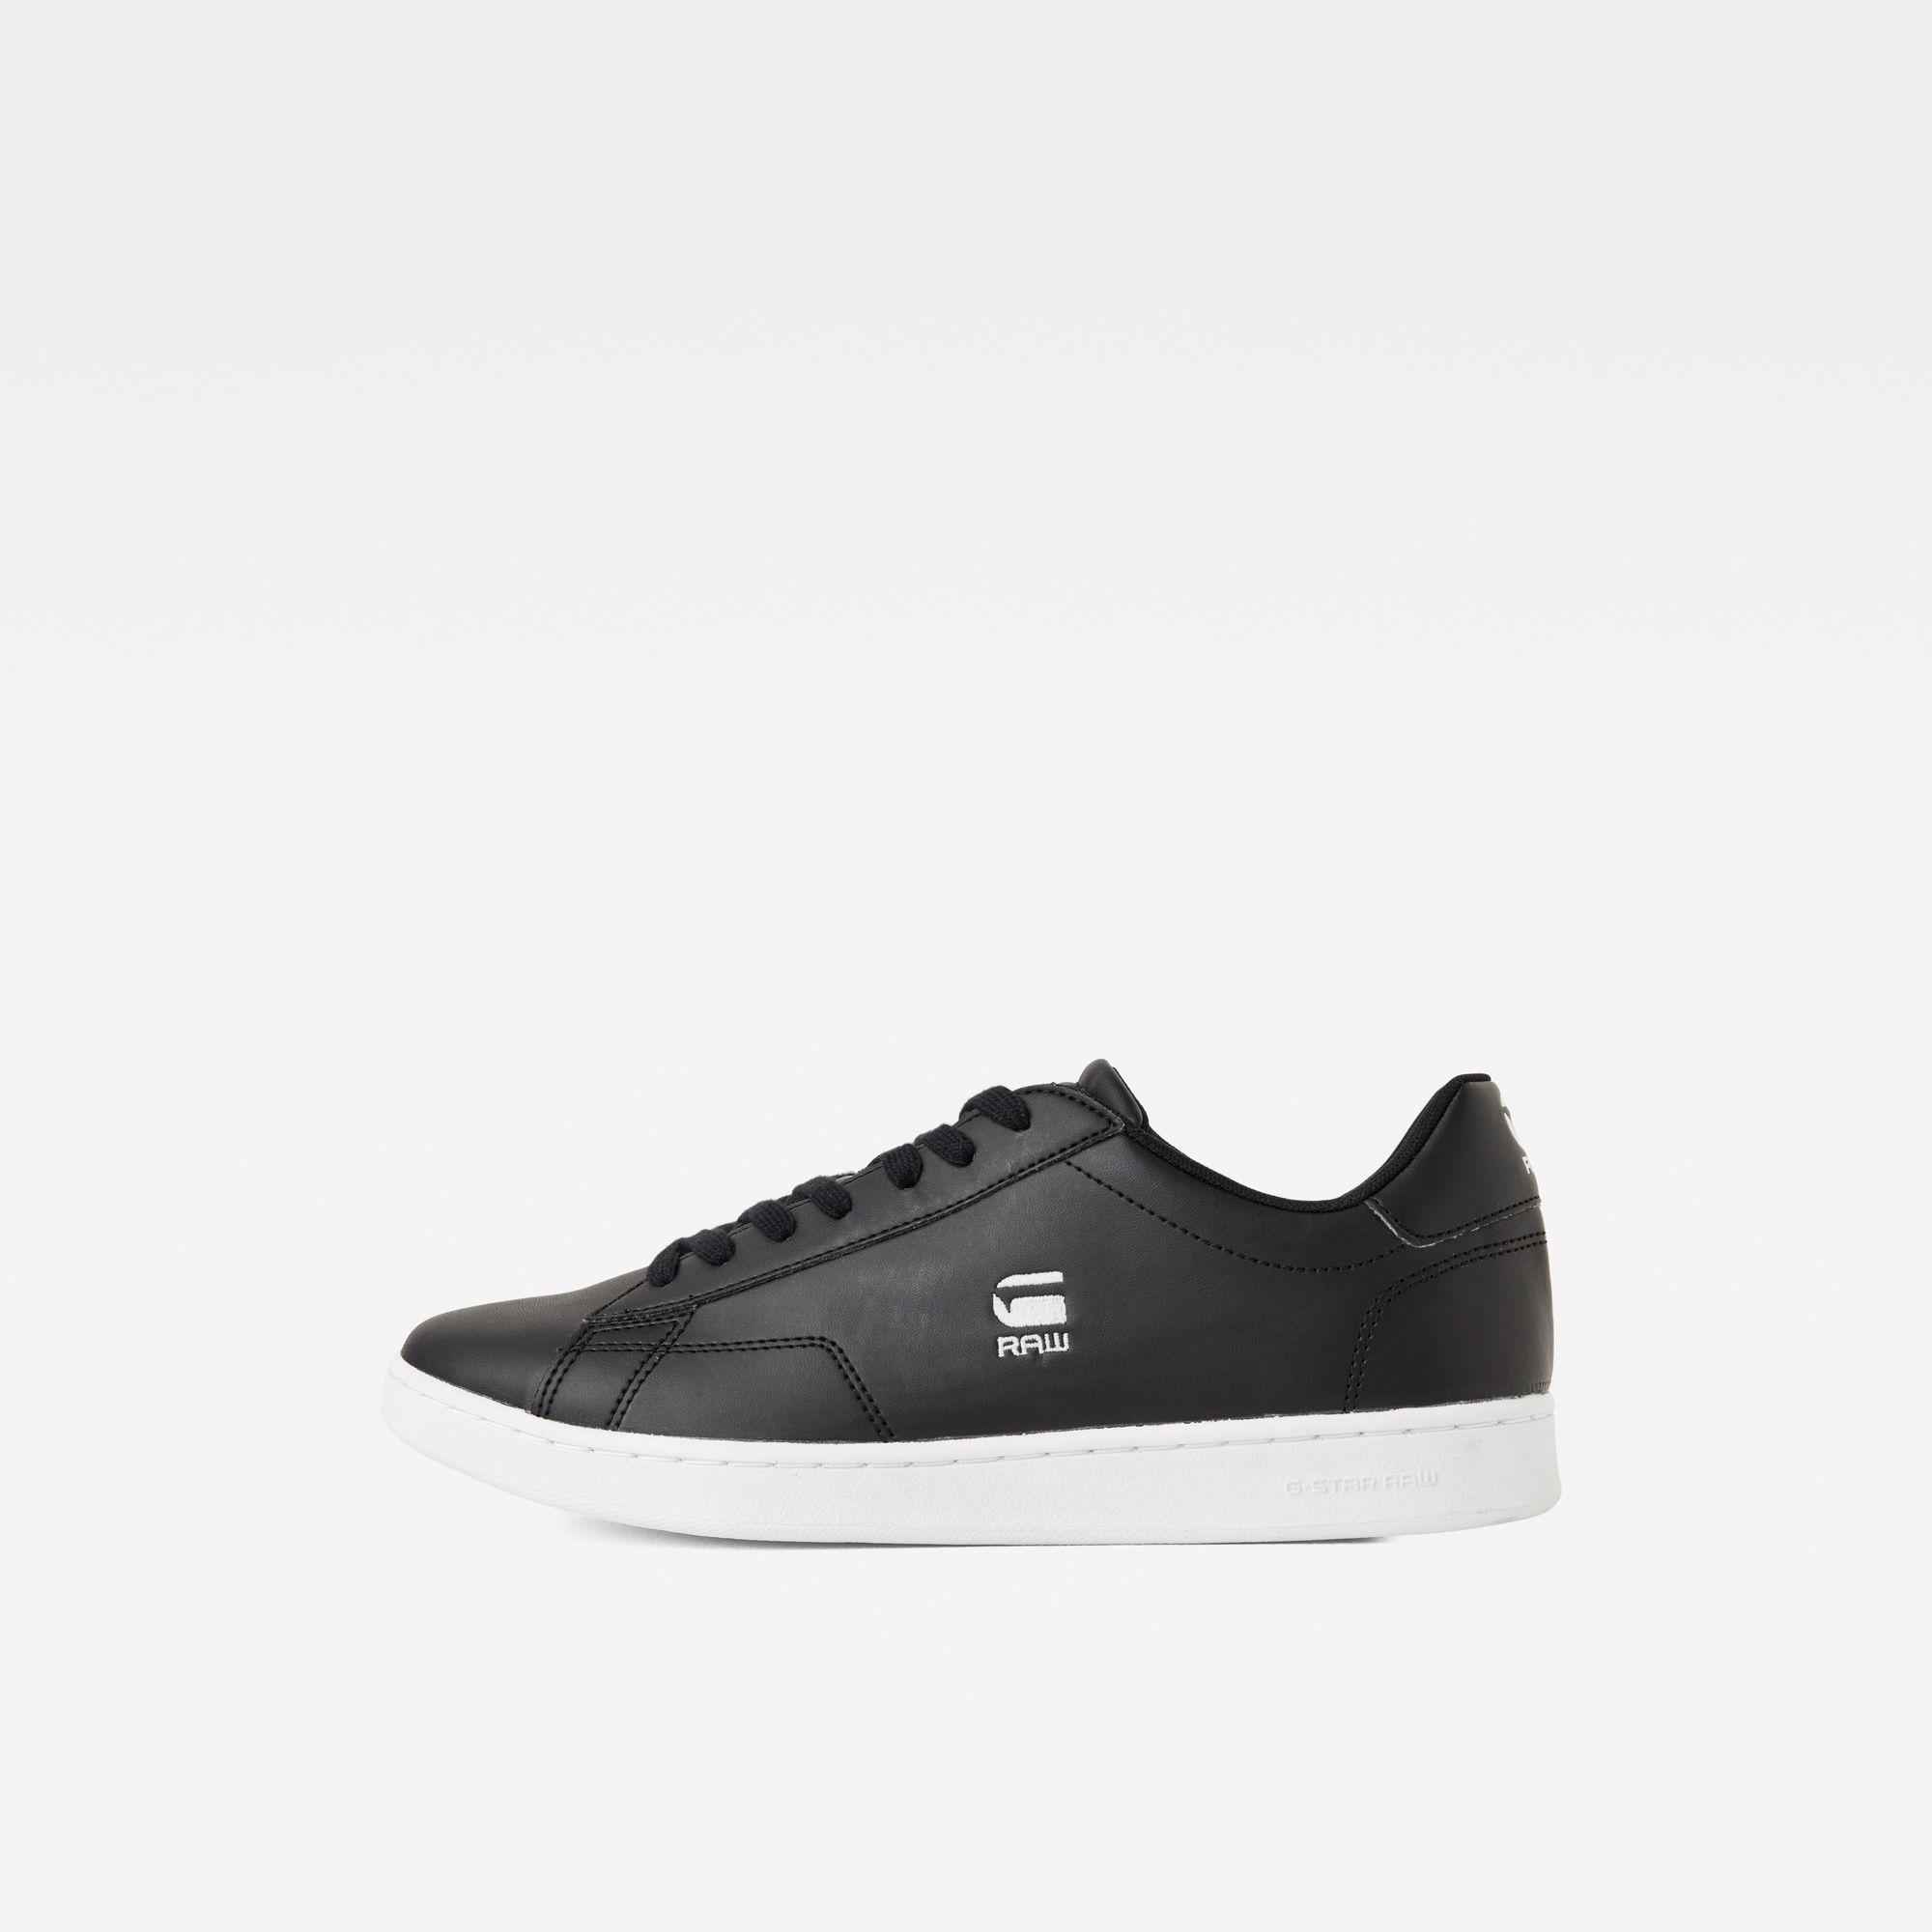 G-Star RAW Heren Cadet Sneakers Zwart